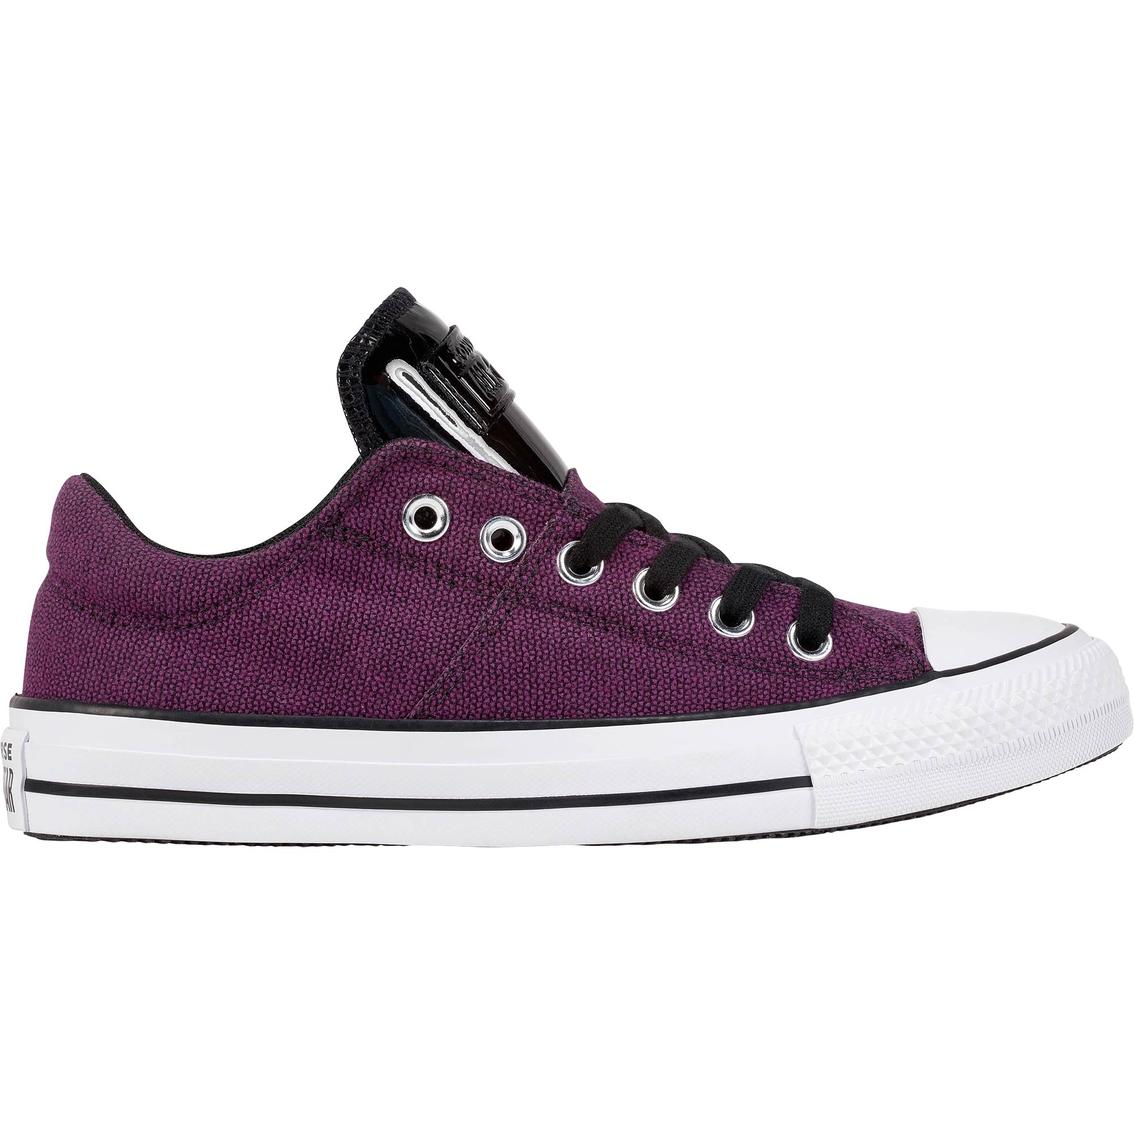 77fefa0993cb29 Converse Chuck Taylor All Star Madison Icon Canvas Shoes